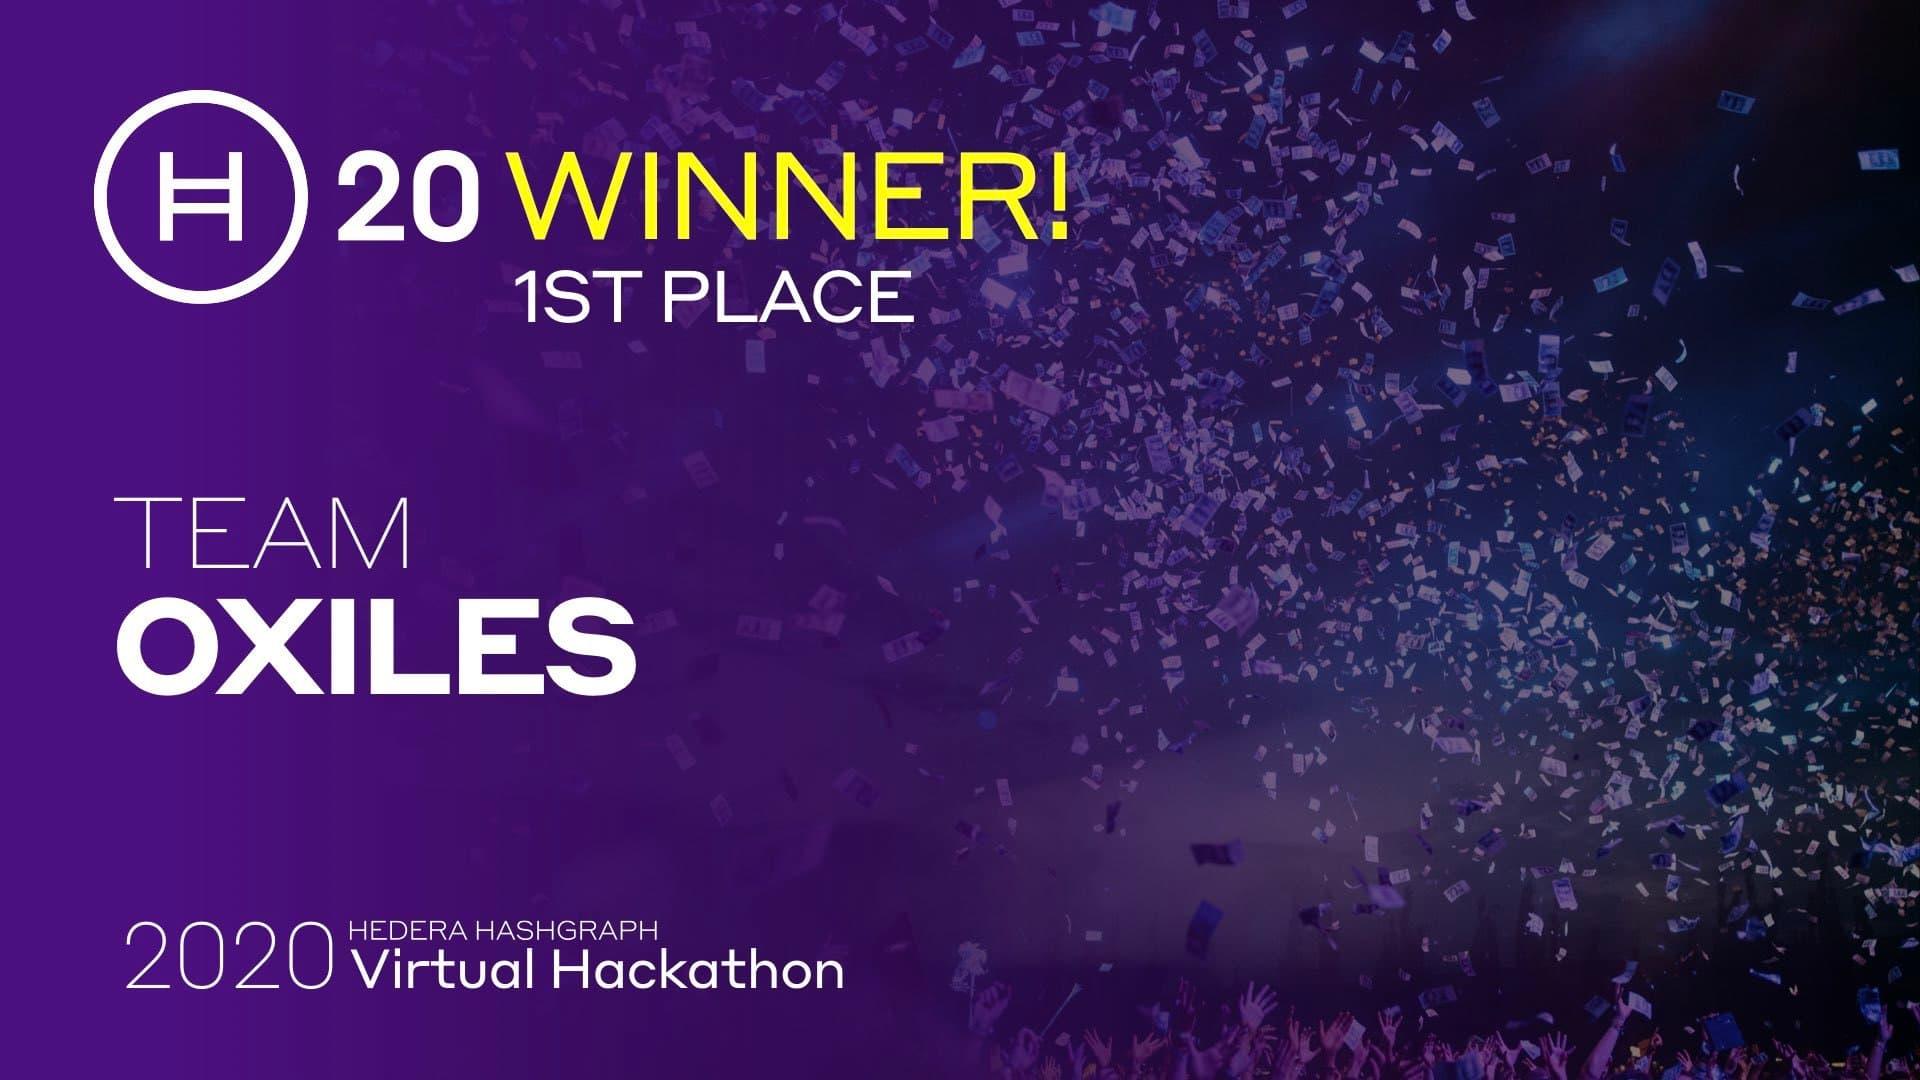 H20 Winners Oxiles